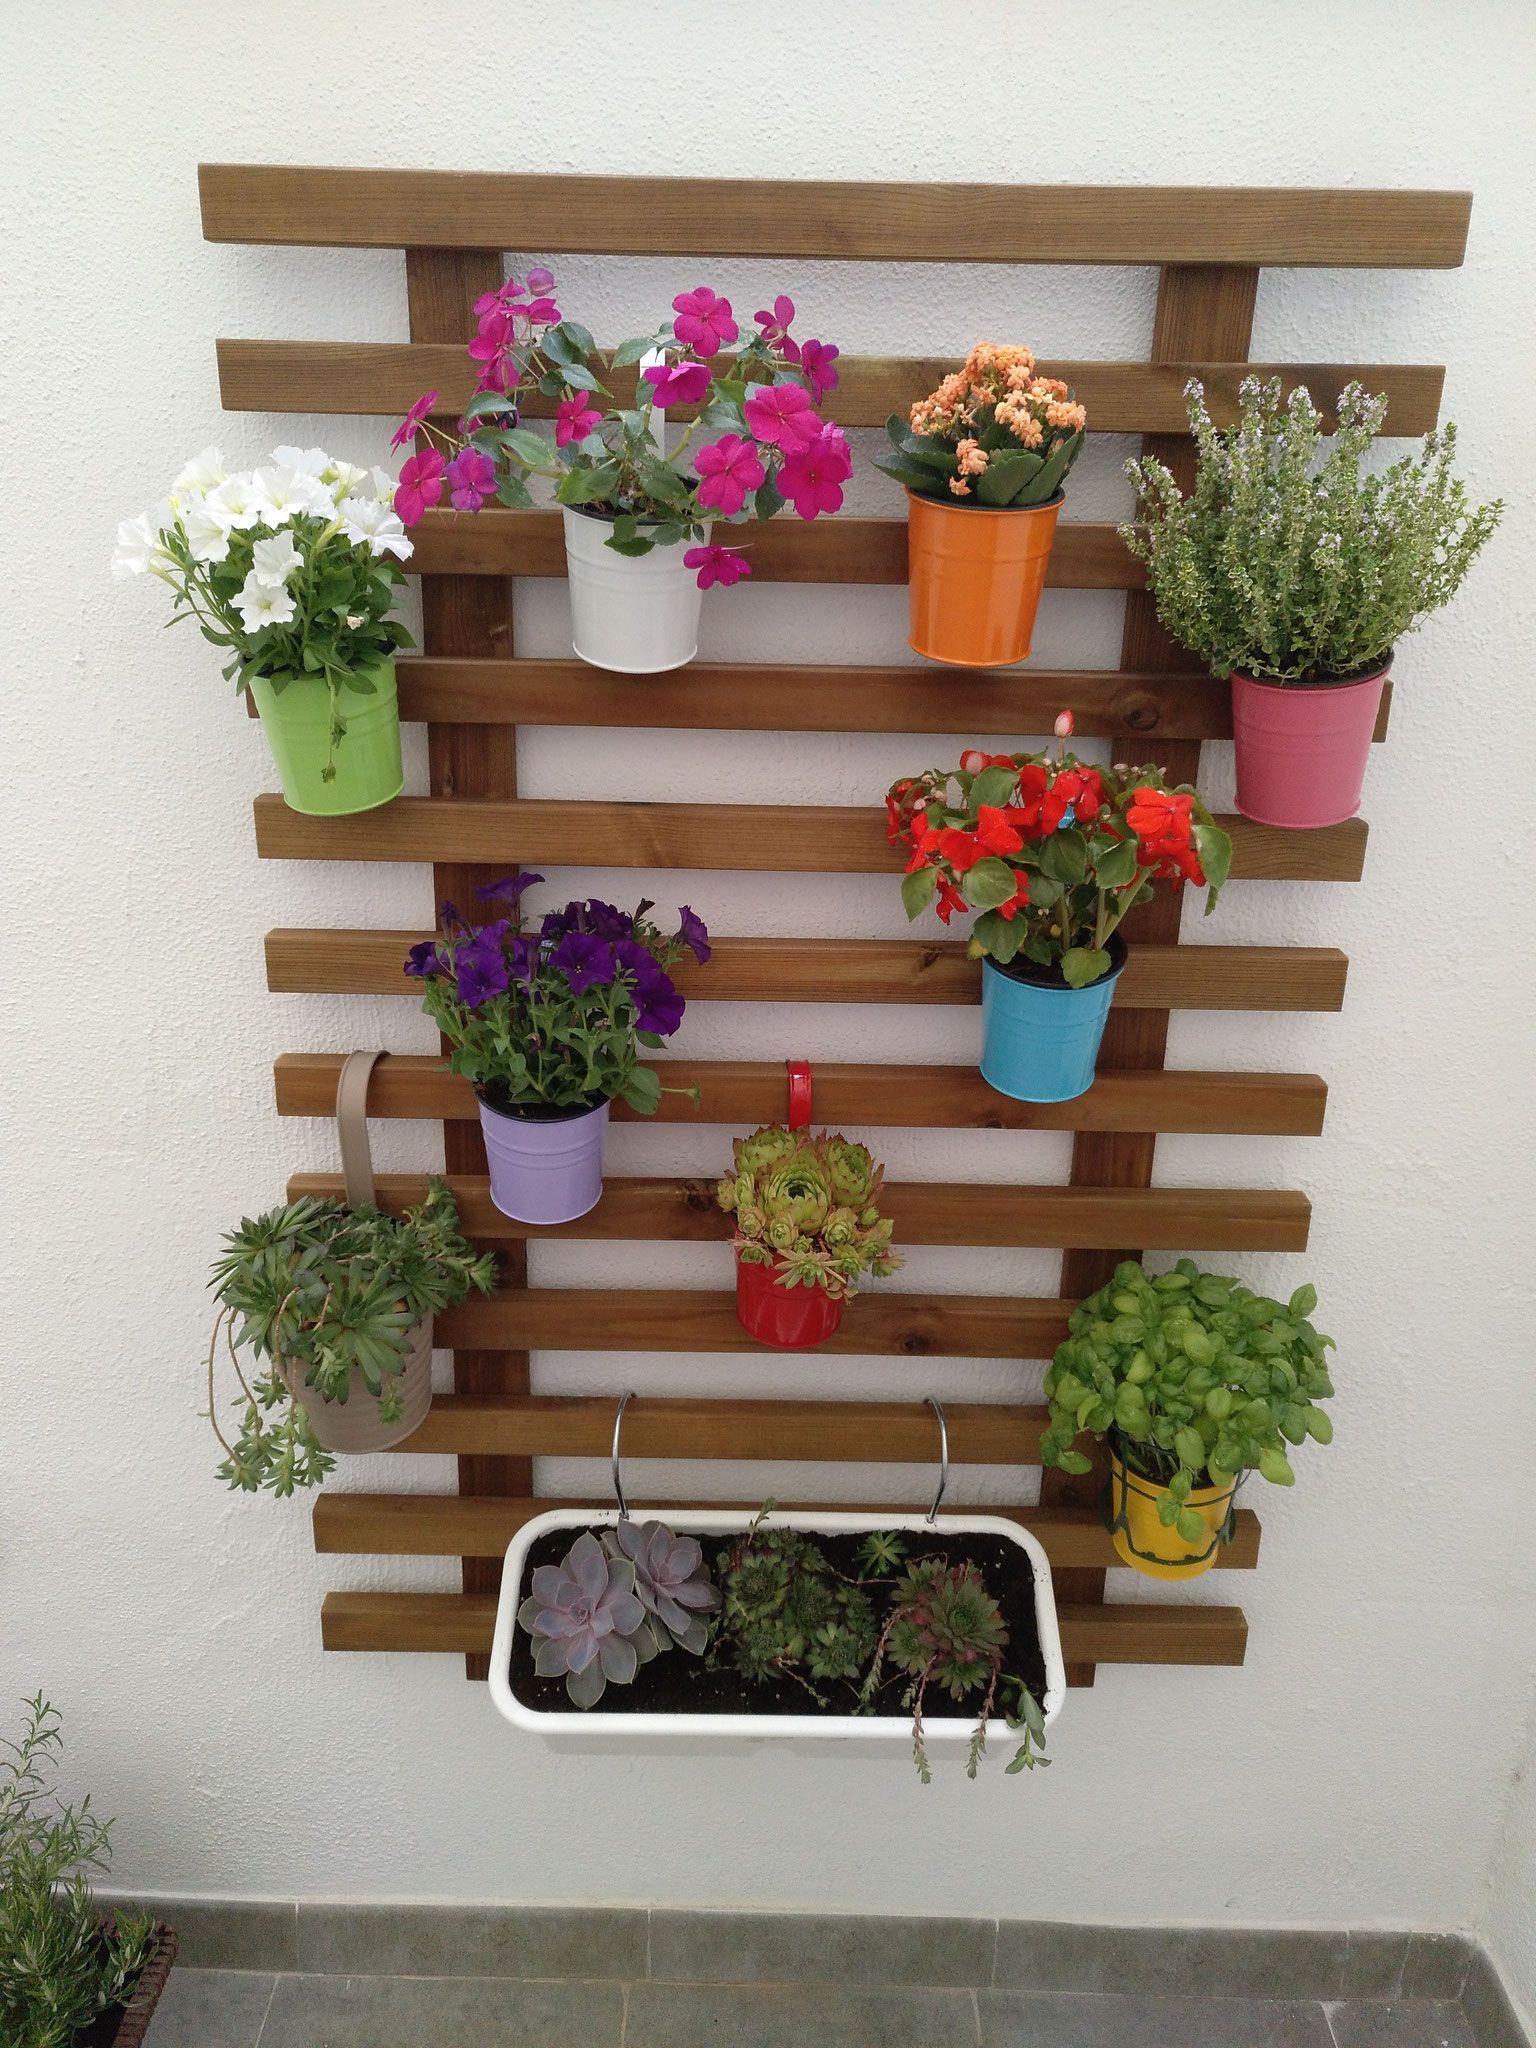 13 Jardineras de madera para pared